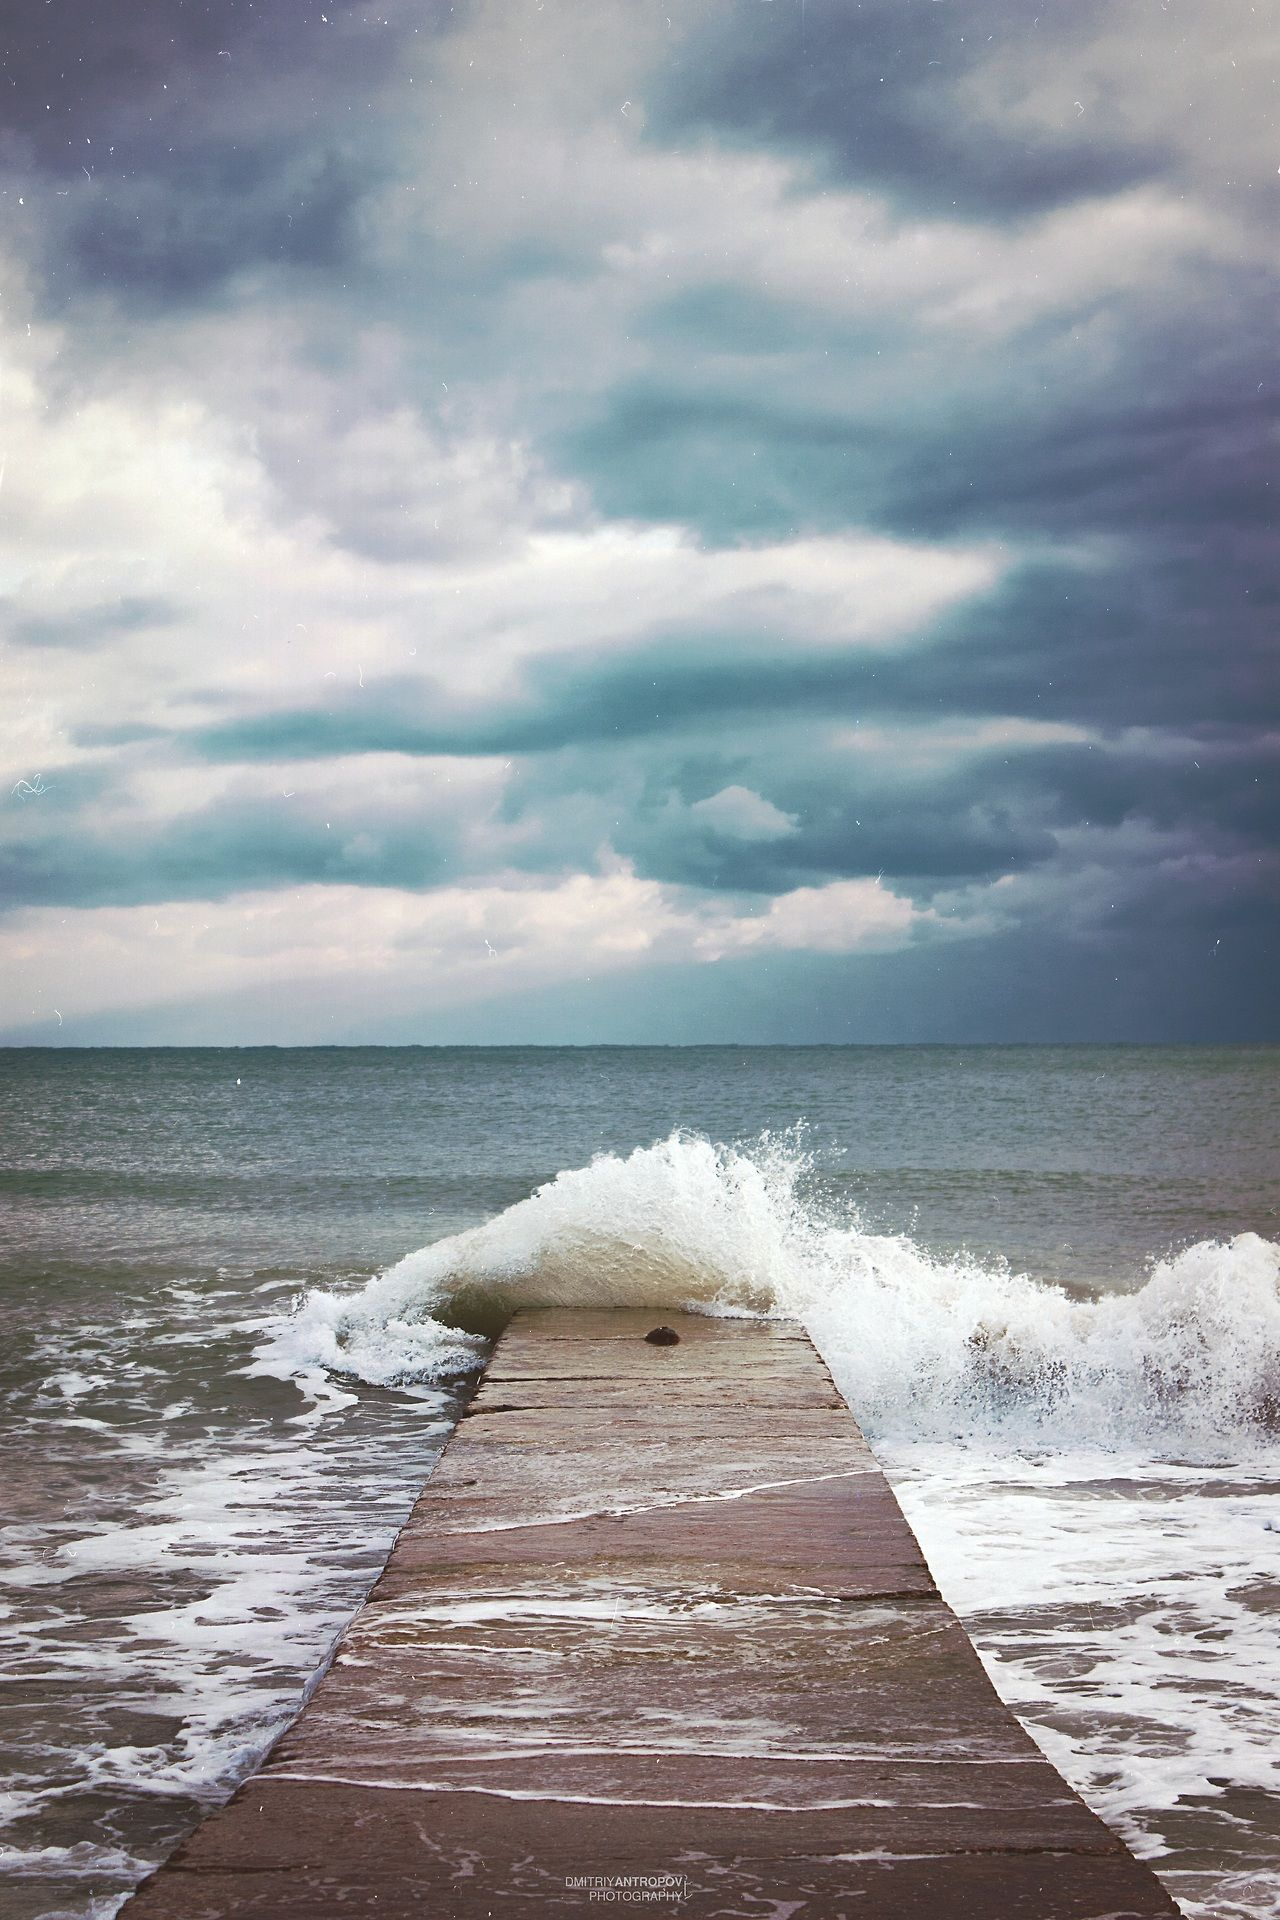 Black Sea, south-eastern Europe by Dmitry Antropov